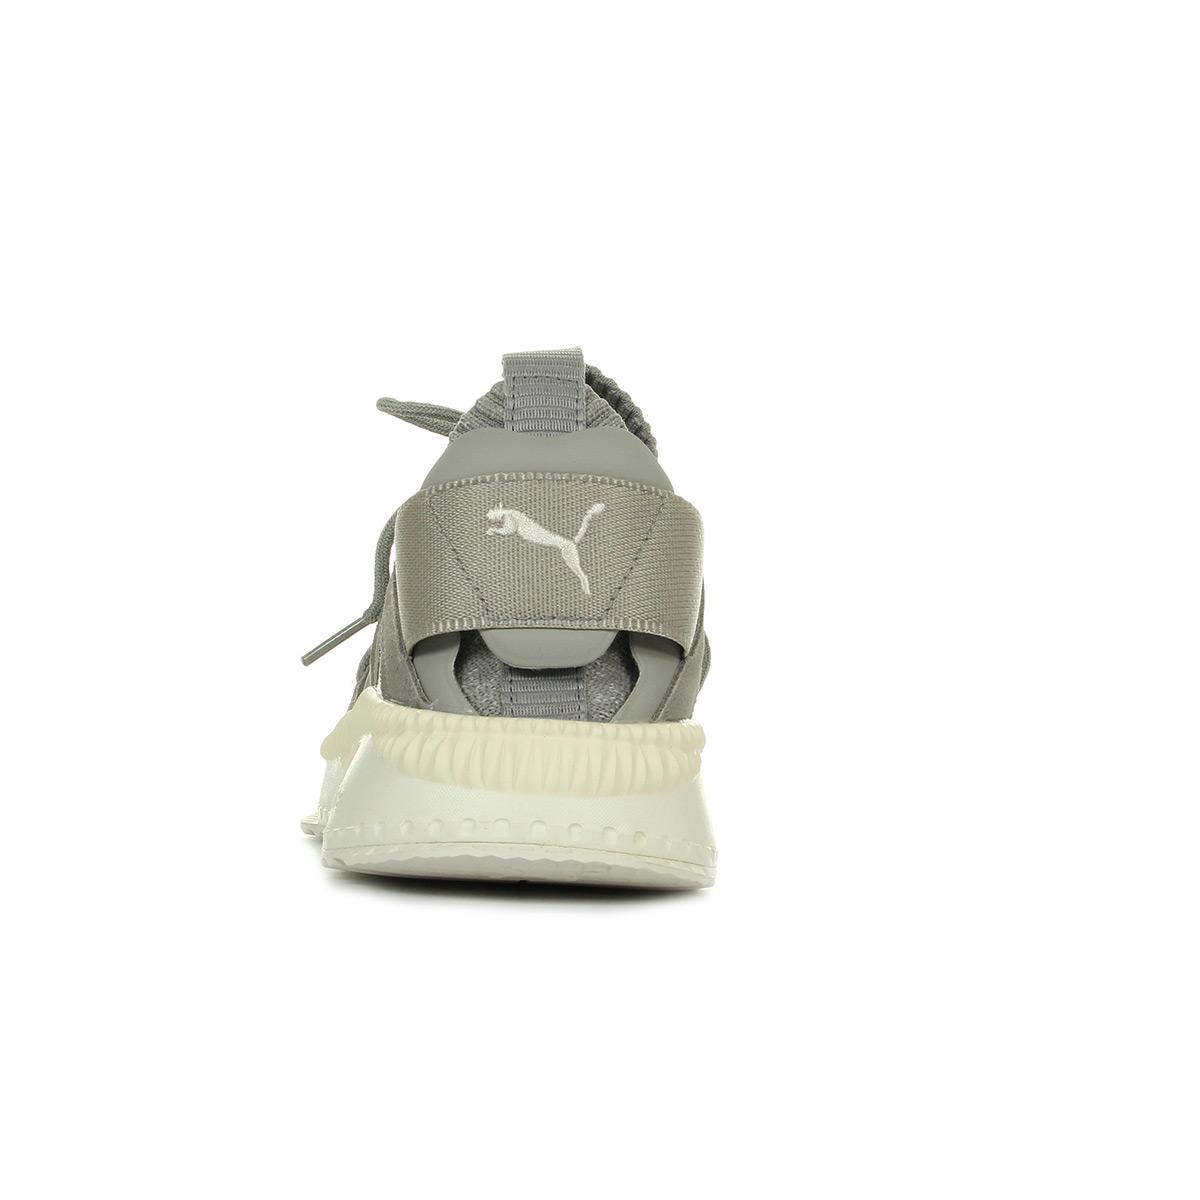 Puma TSUGI Blaze evoKNIT 36440802, Baskets mode